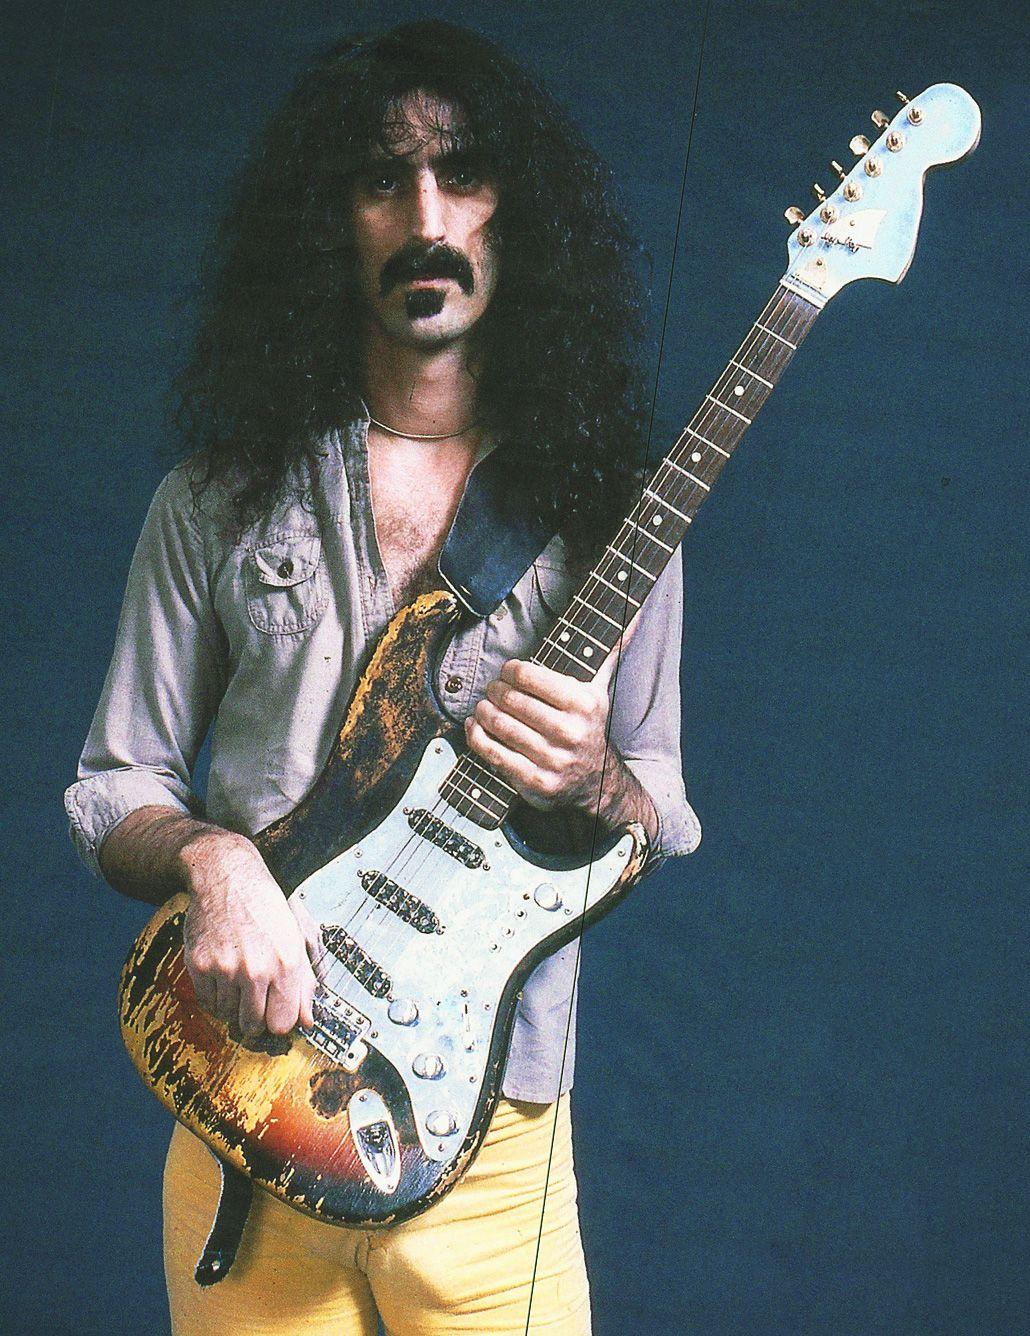 Frank Zappa Holding The Burnt Stratocaster His Friend Jimi